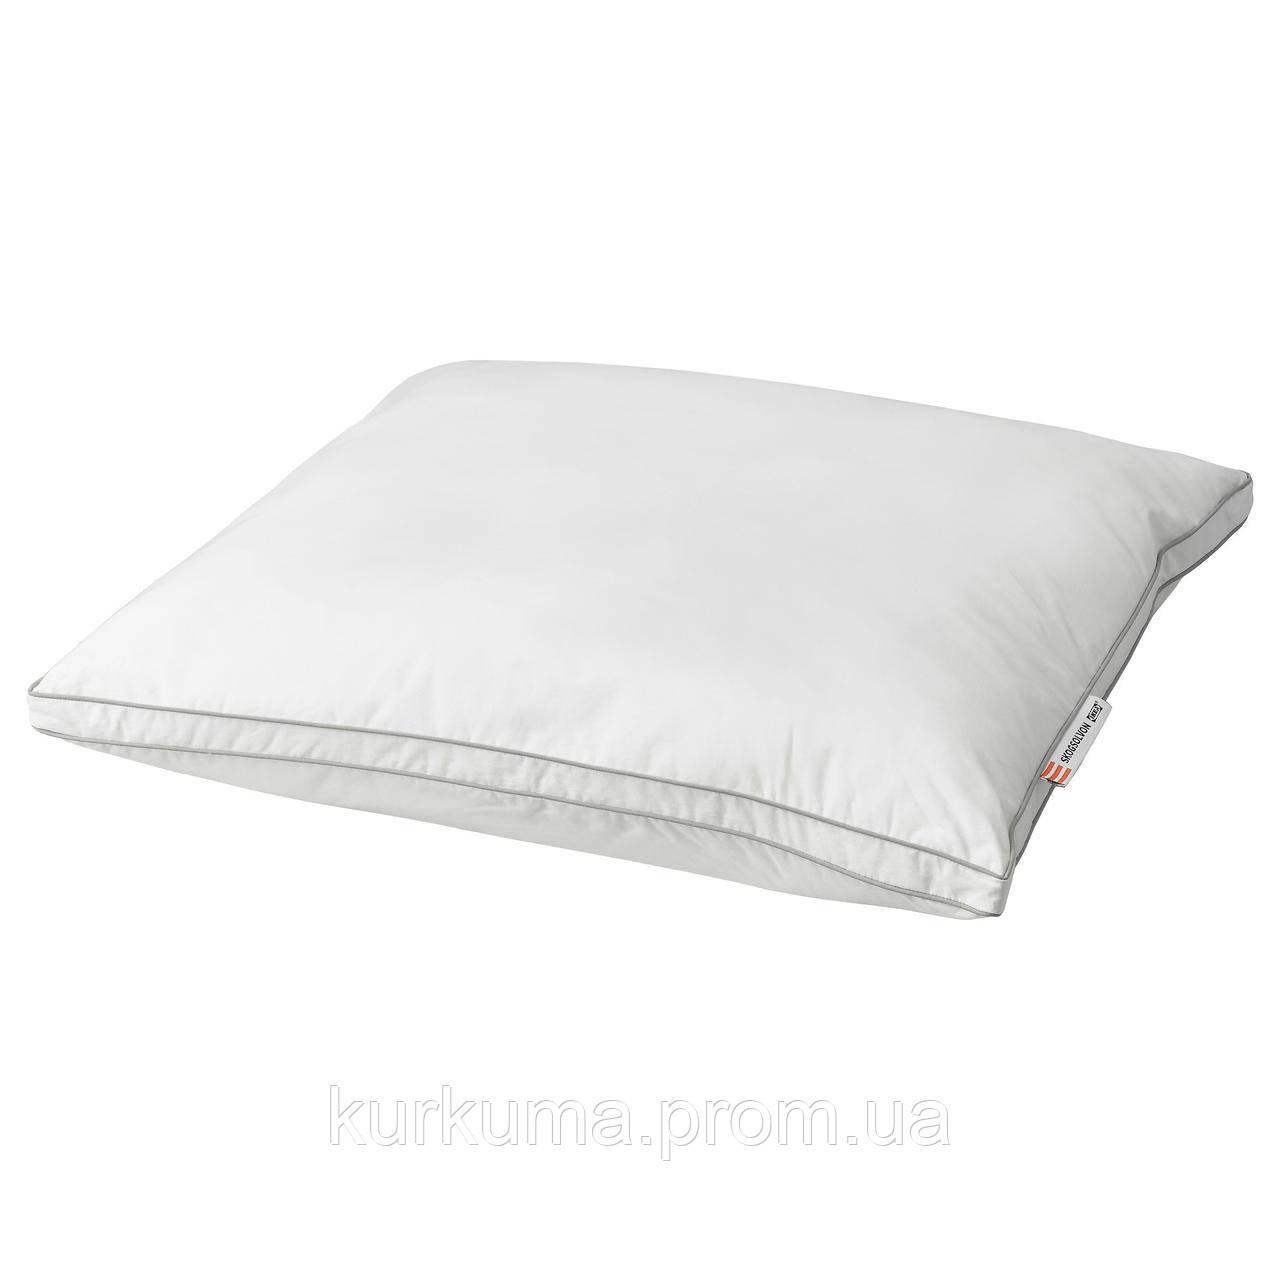 IKEA SKOGSOLVON Подушка, низкая  (404.343.03)